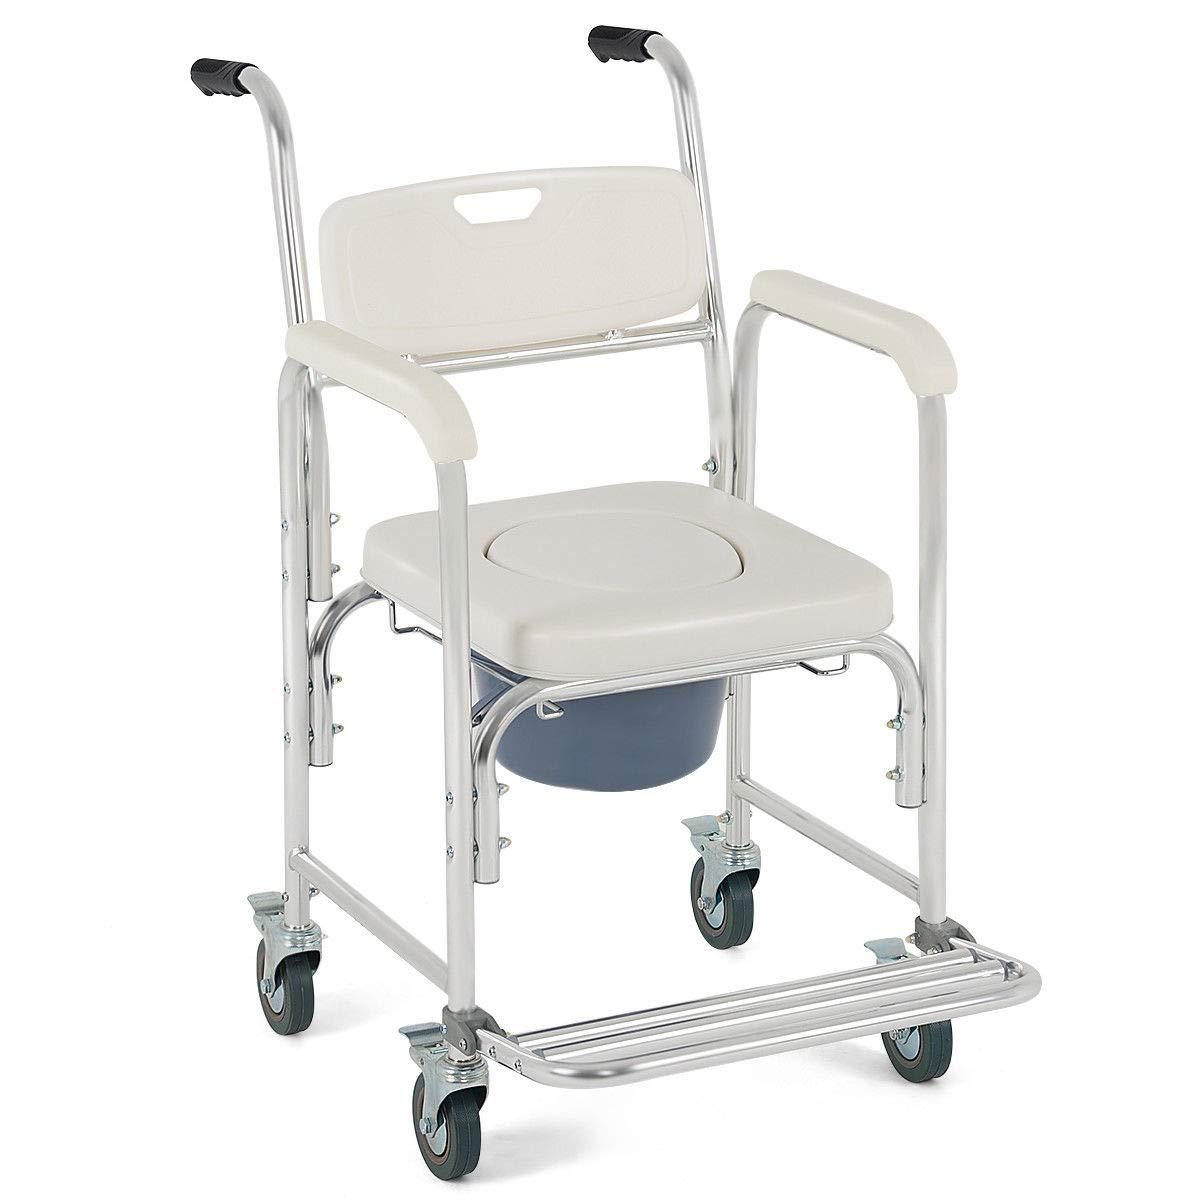 Giantex Medical Transport Commode Wheelchair